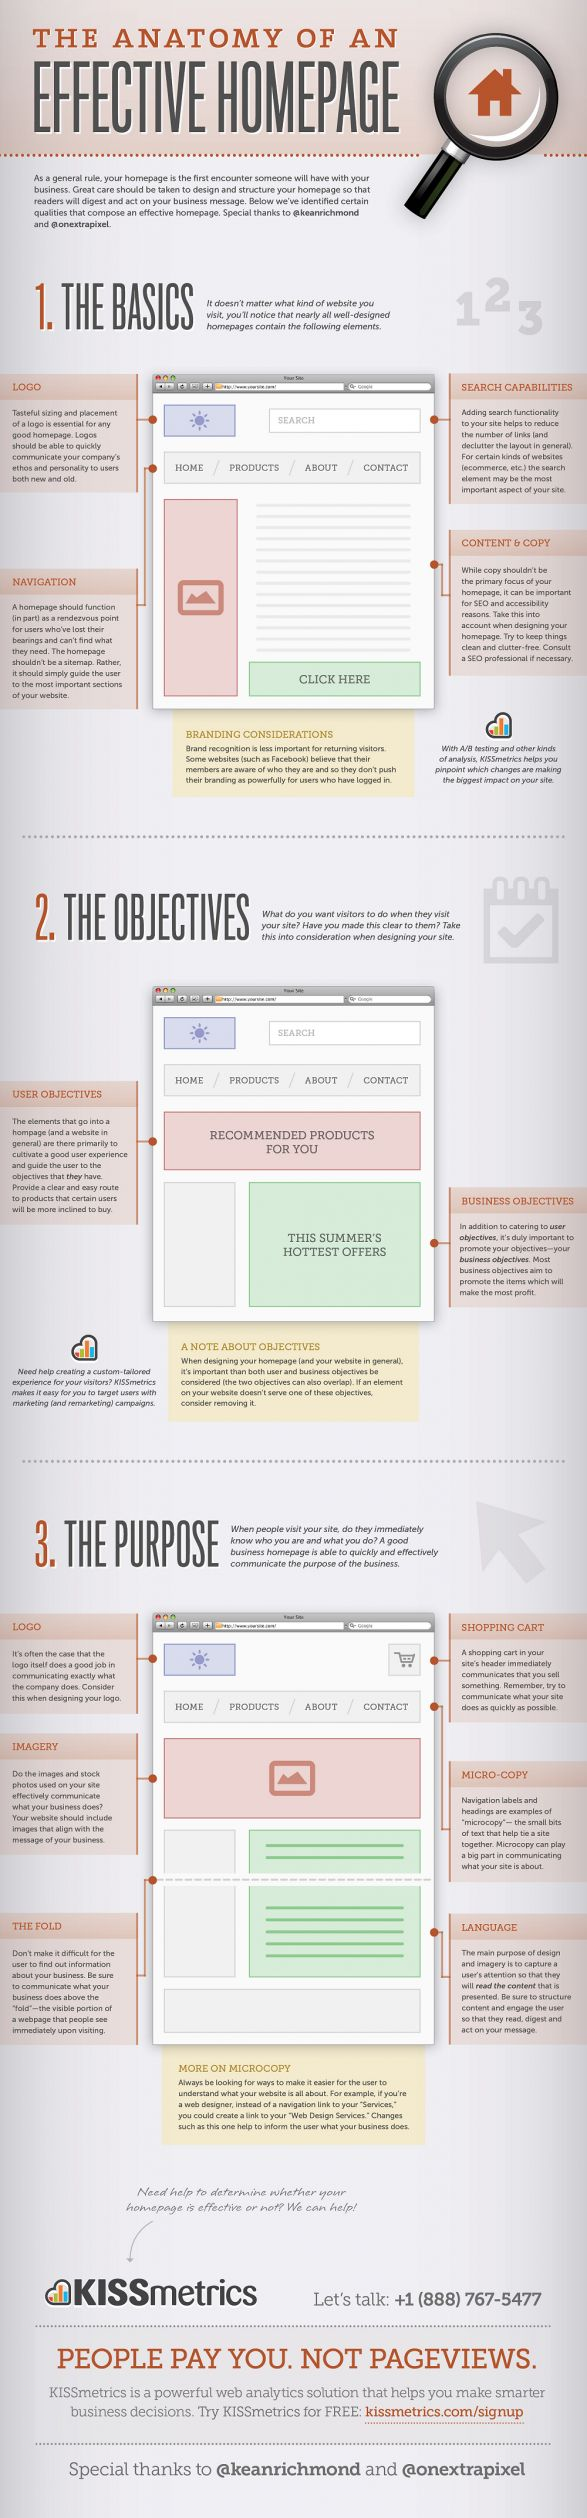 The Anatomy of an Effective Homepage. #infographic: Webdesign, Social Network, Web Design, Social Media, Web Pages, Website Layout, Website Design, Infographic, Socialmedia